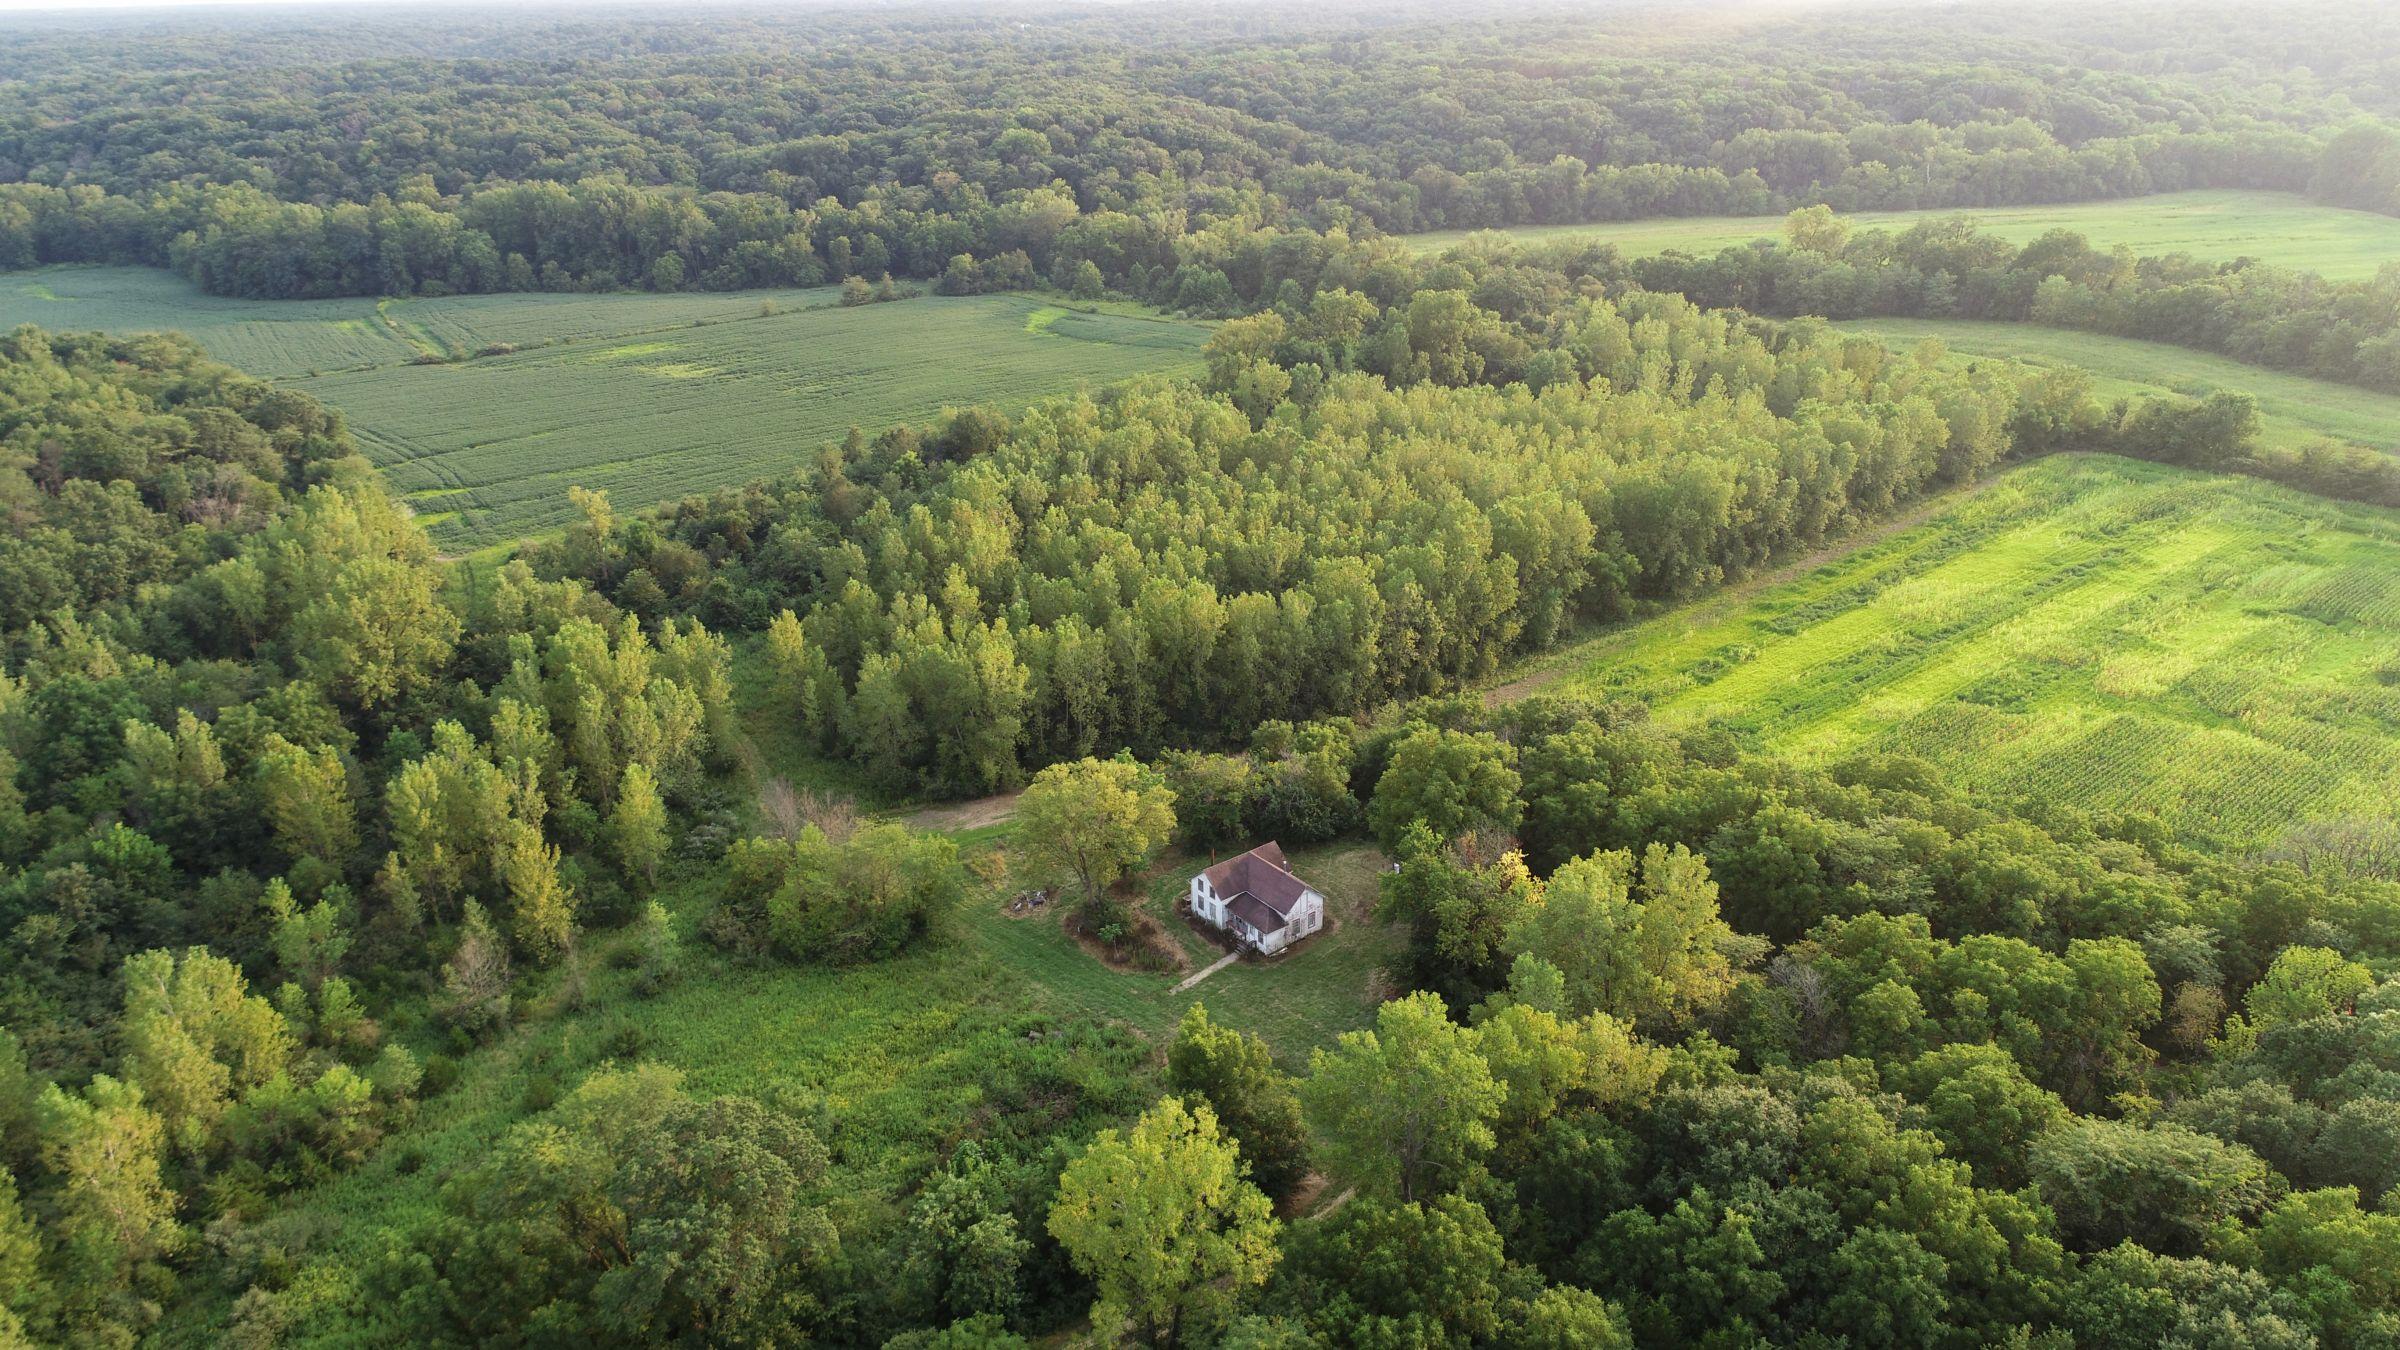 land-lee-county-iowa-328-acres-listing-number-15137-7-2020-08-27-175037.jpg